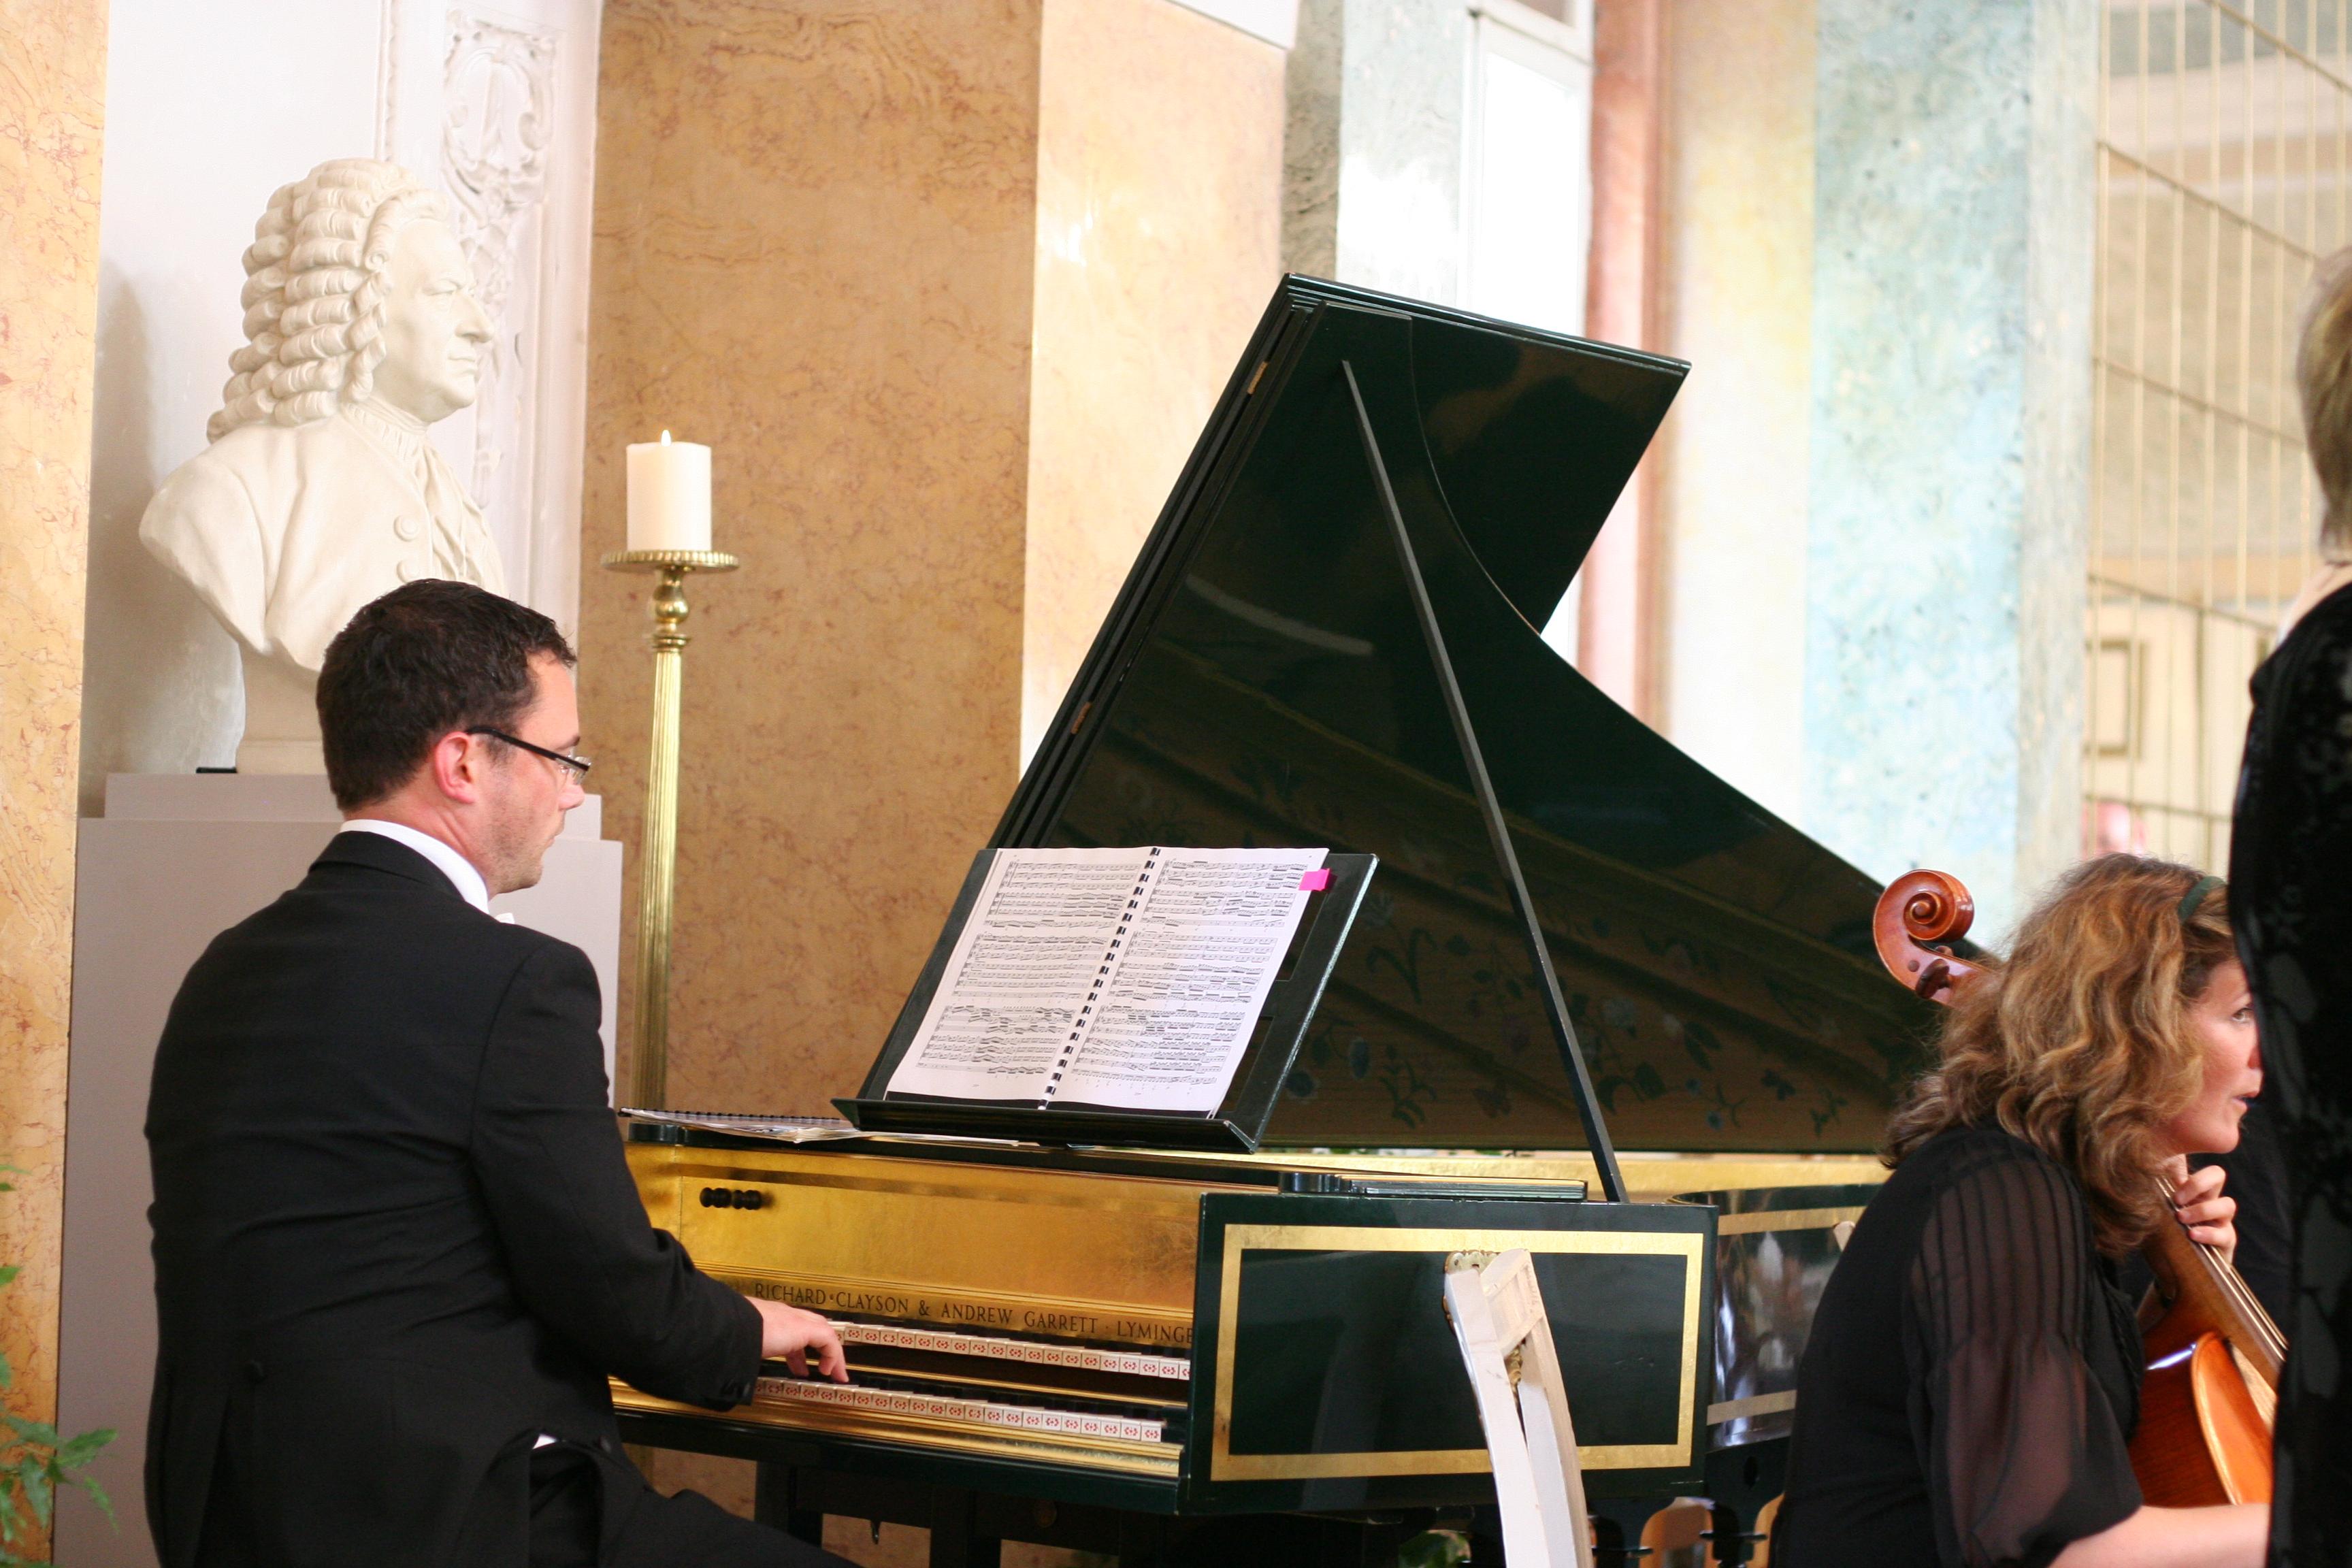 Konzert unter der Bach-Büste im Spiegelsaal Schloss Köthen (Sachsen-Anhalt)